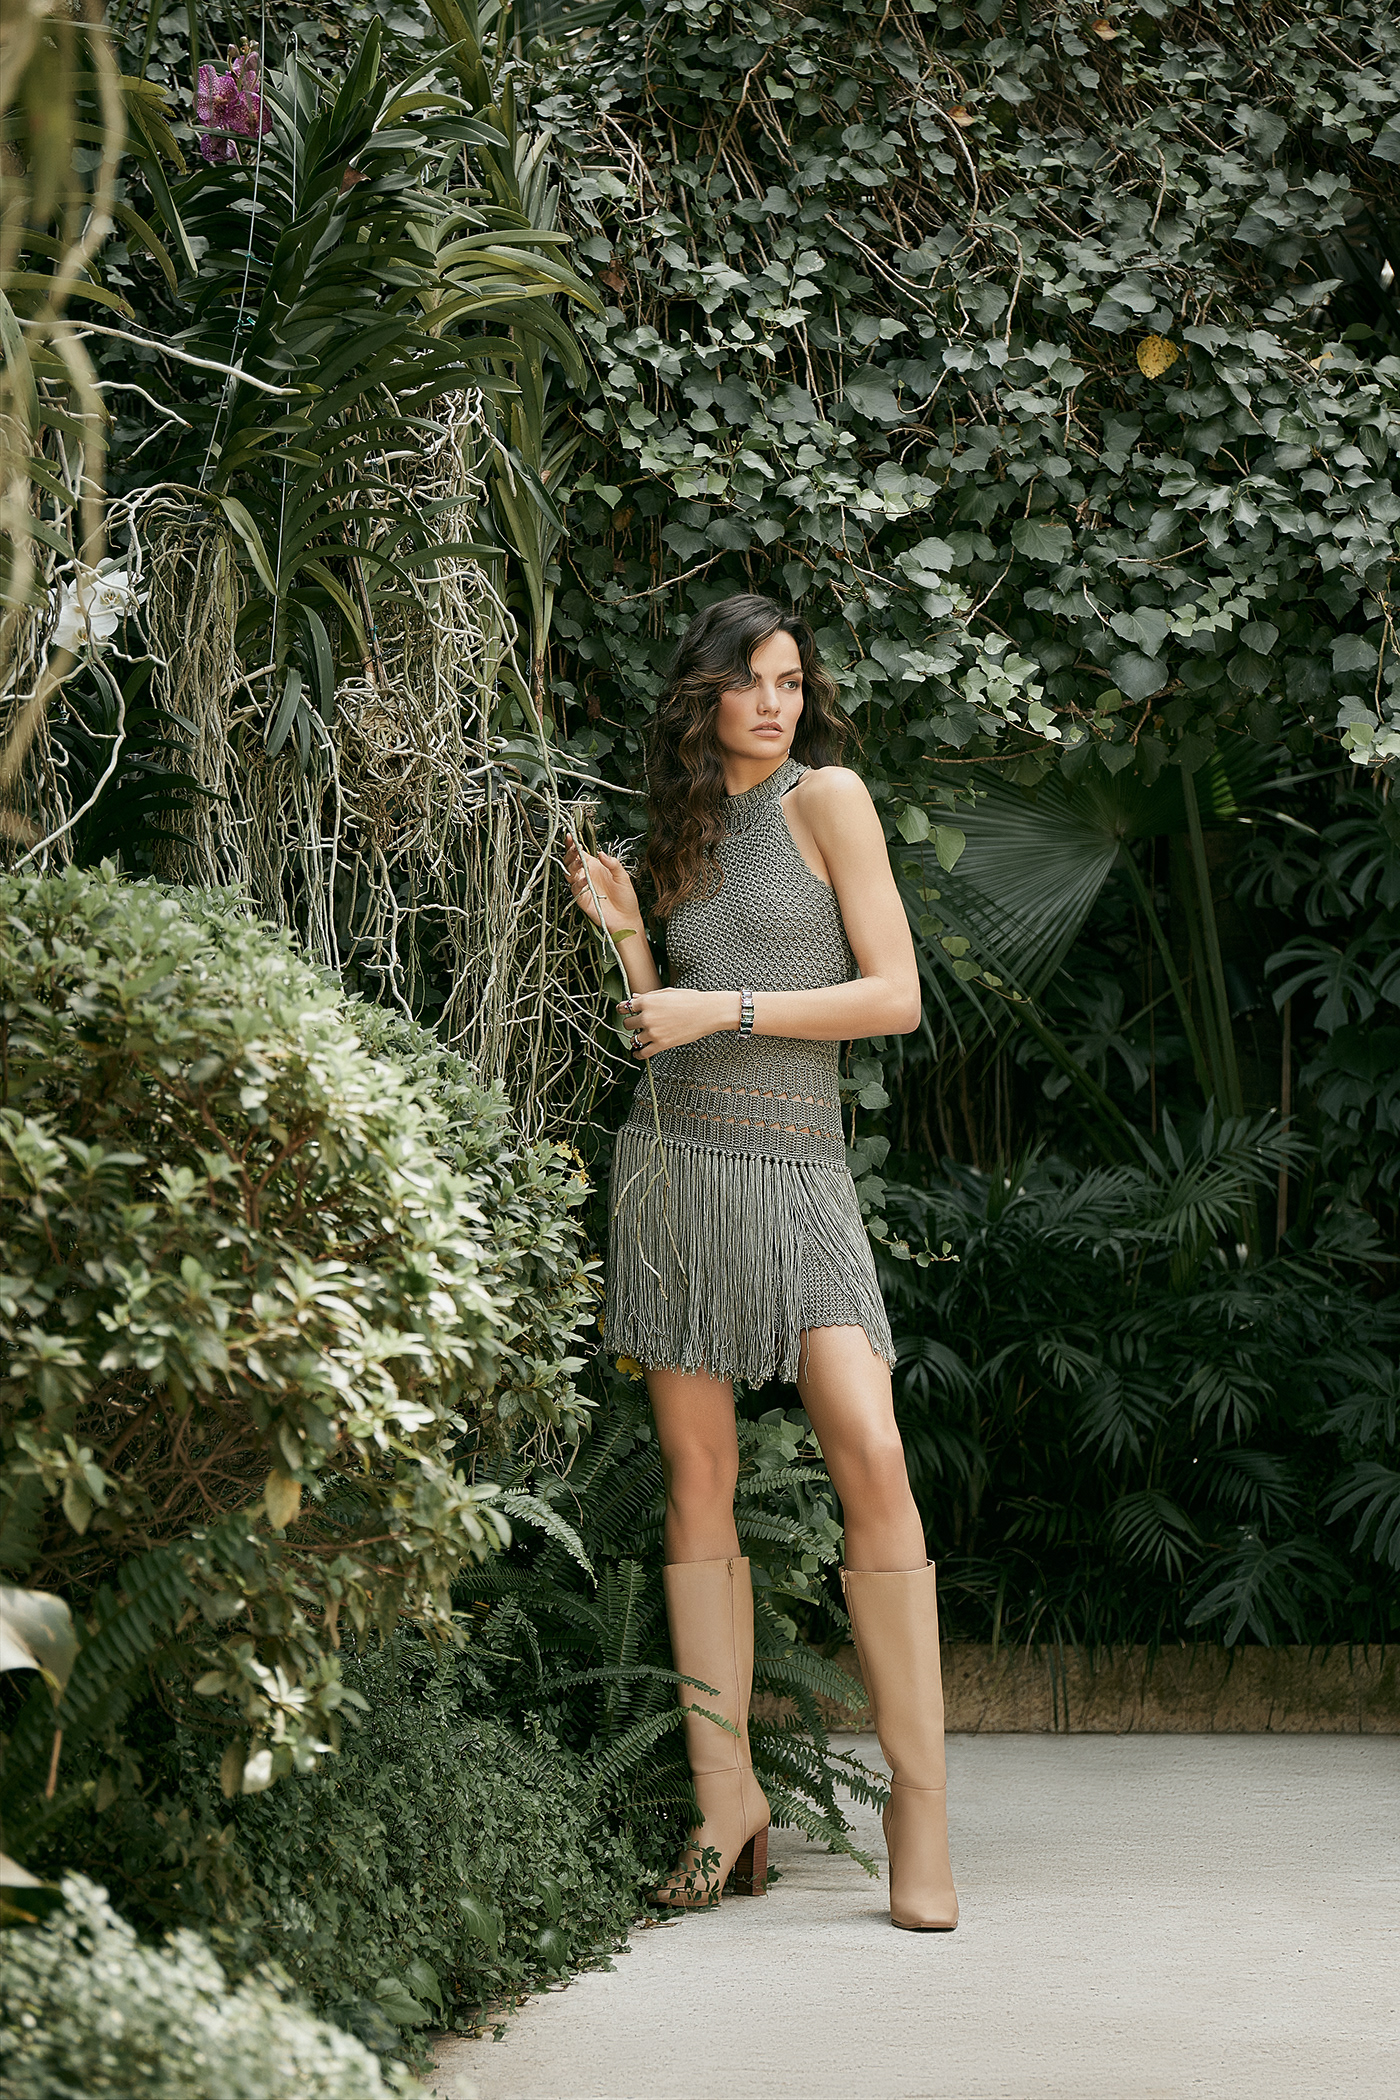 campaign Fashion  garden highend magazine model photoshoot photoshop retouch